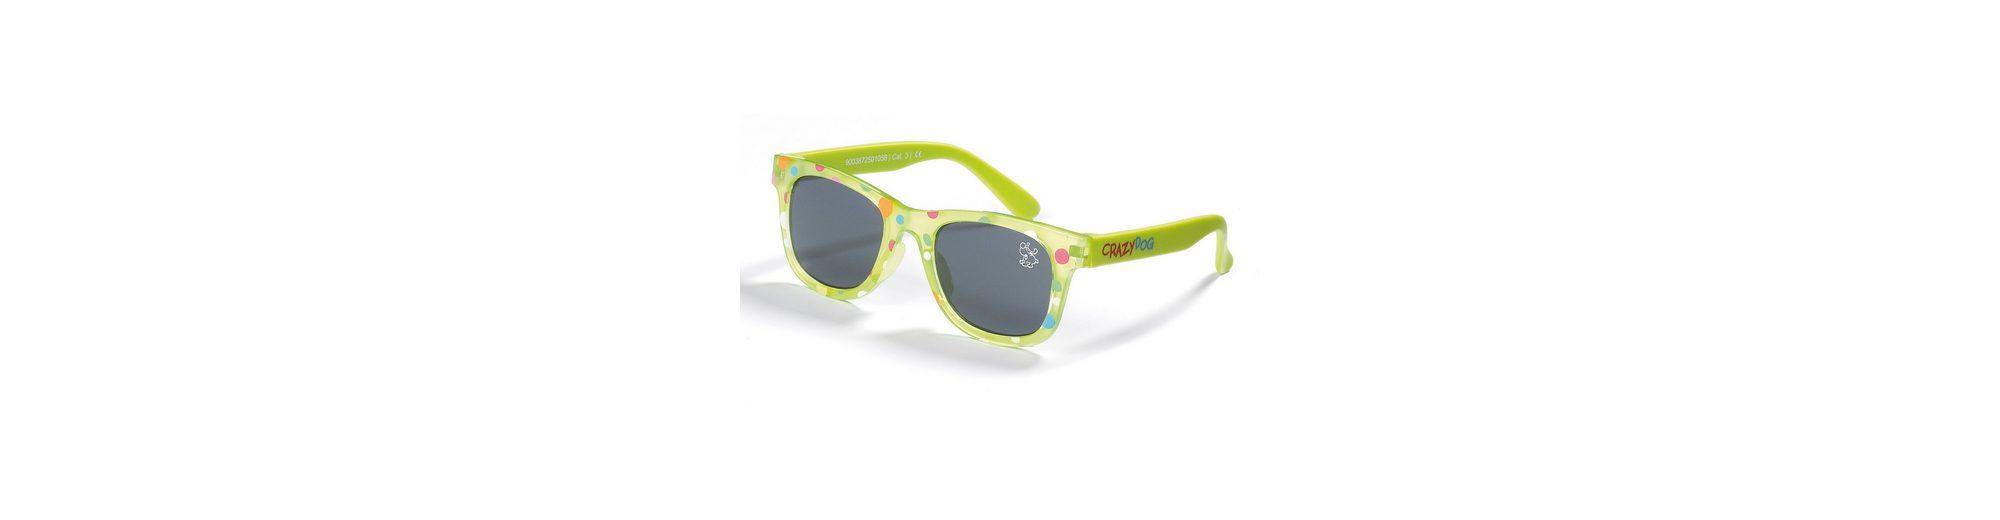 "BABY-WALZ Kinder-Sonnenbrille ""style"""